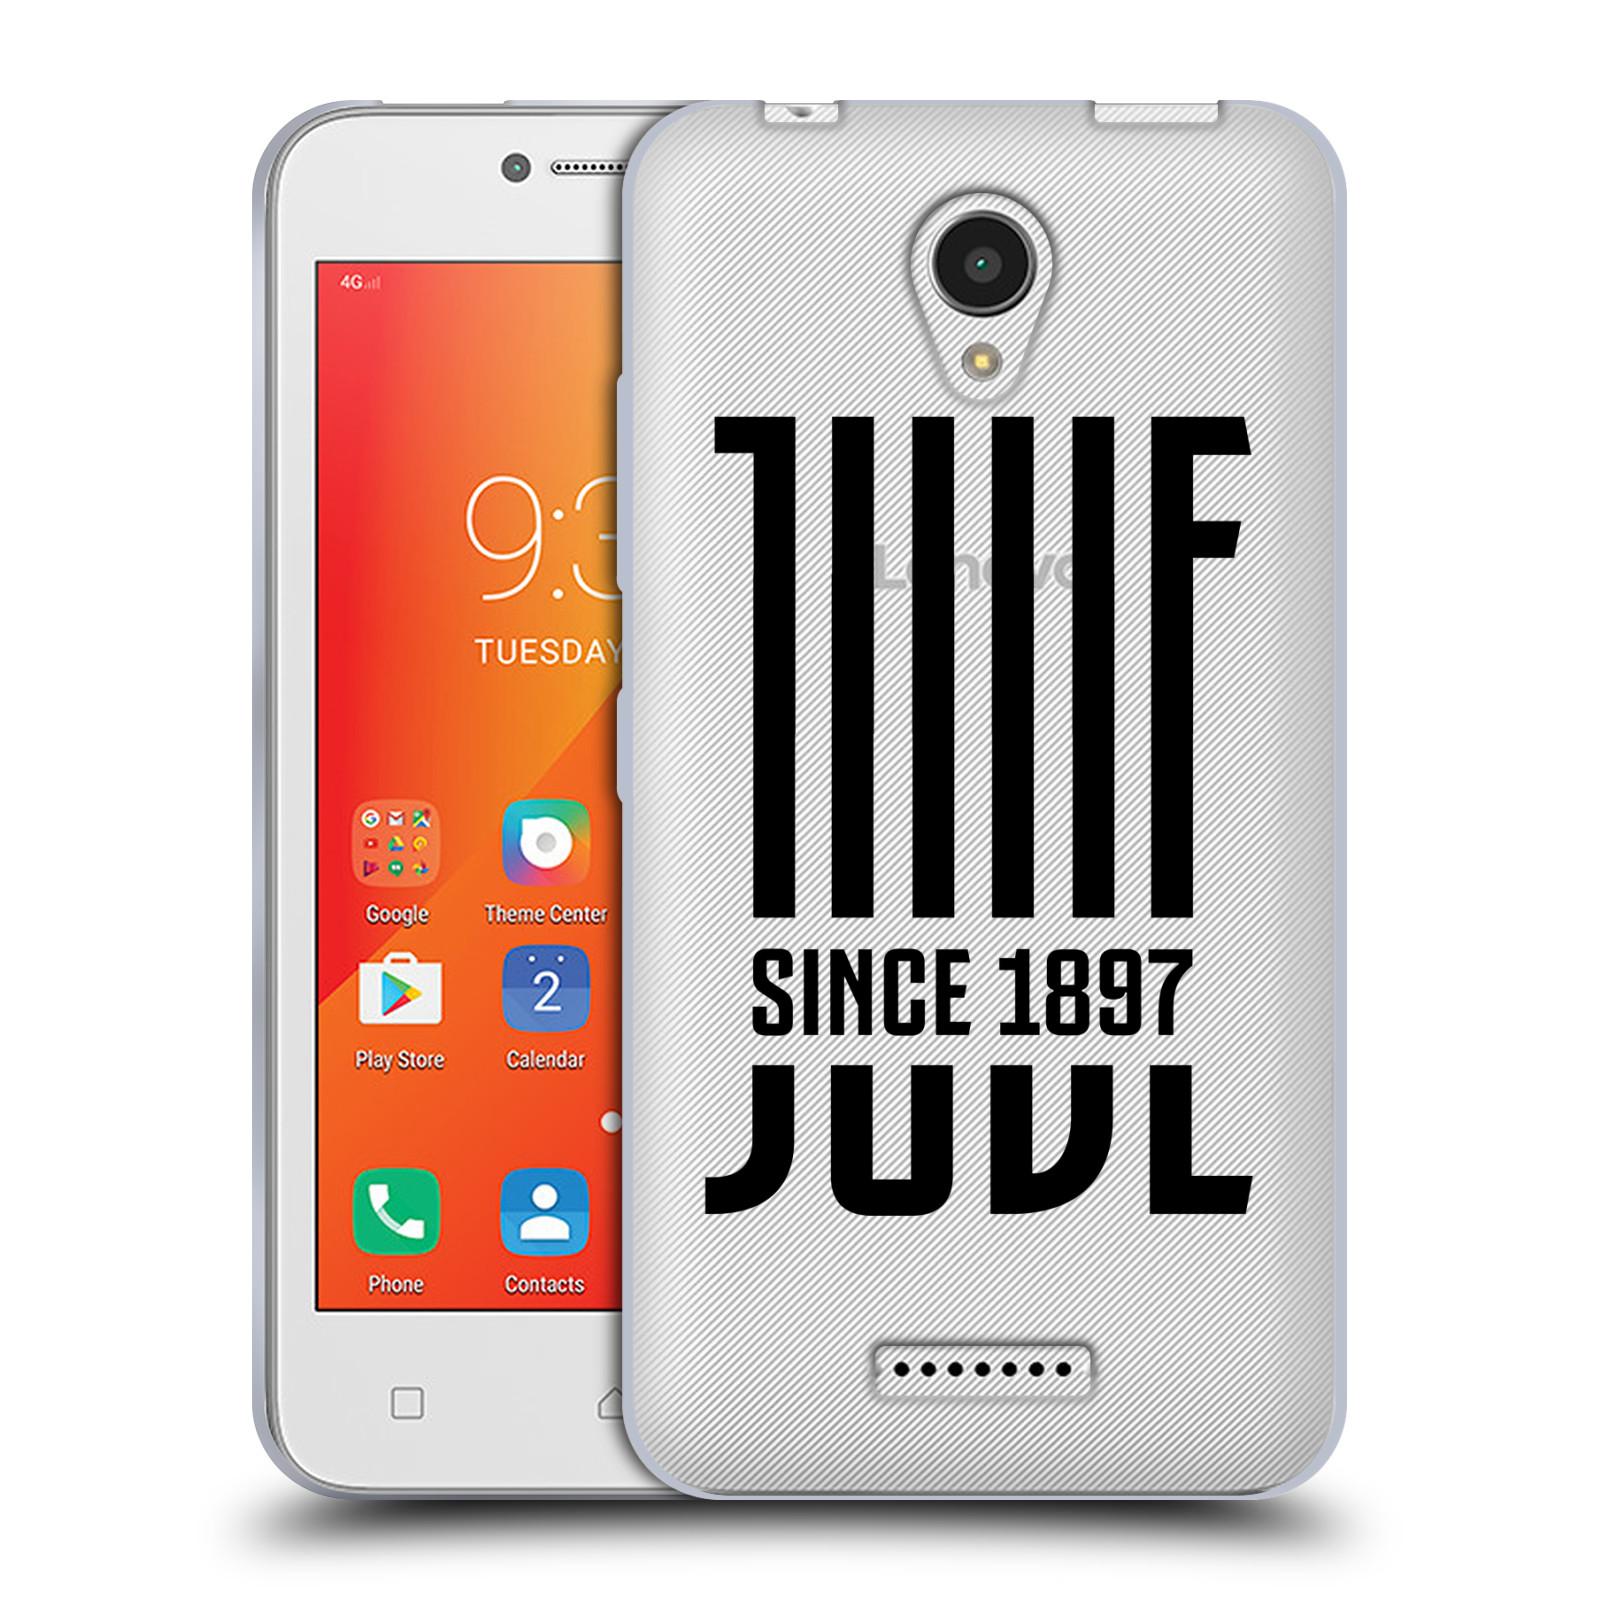 HEAD CASE silikonový obal na mobil Lenovo A PLUS Fotbalový klub Juventus FC  průhledný černá JUVE 459c97ce9e5